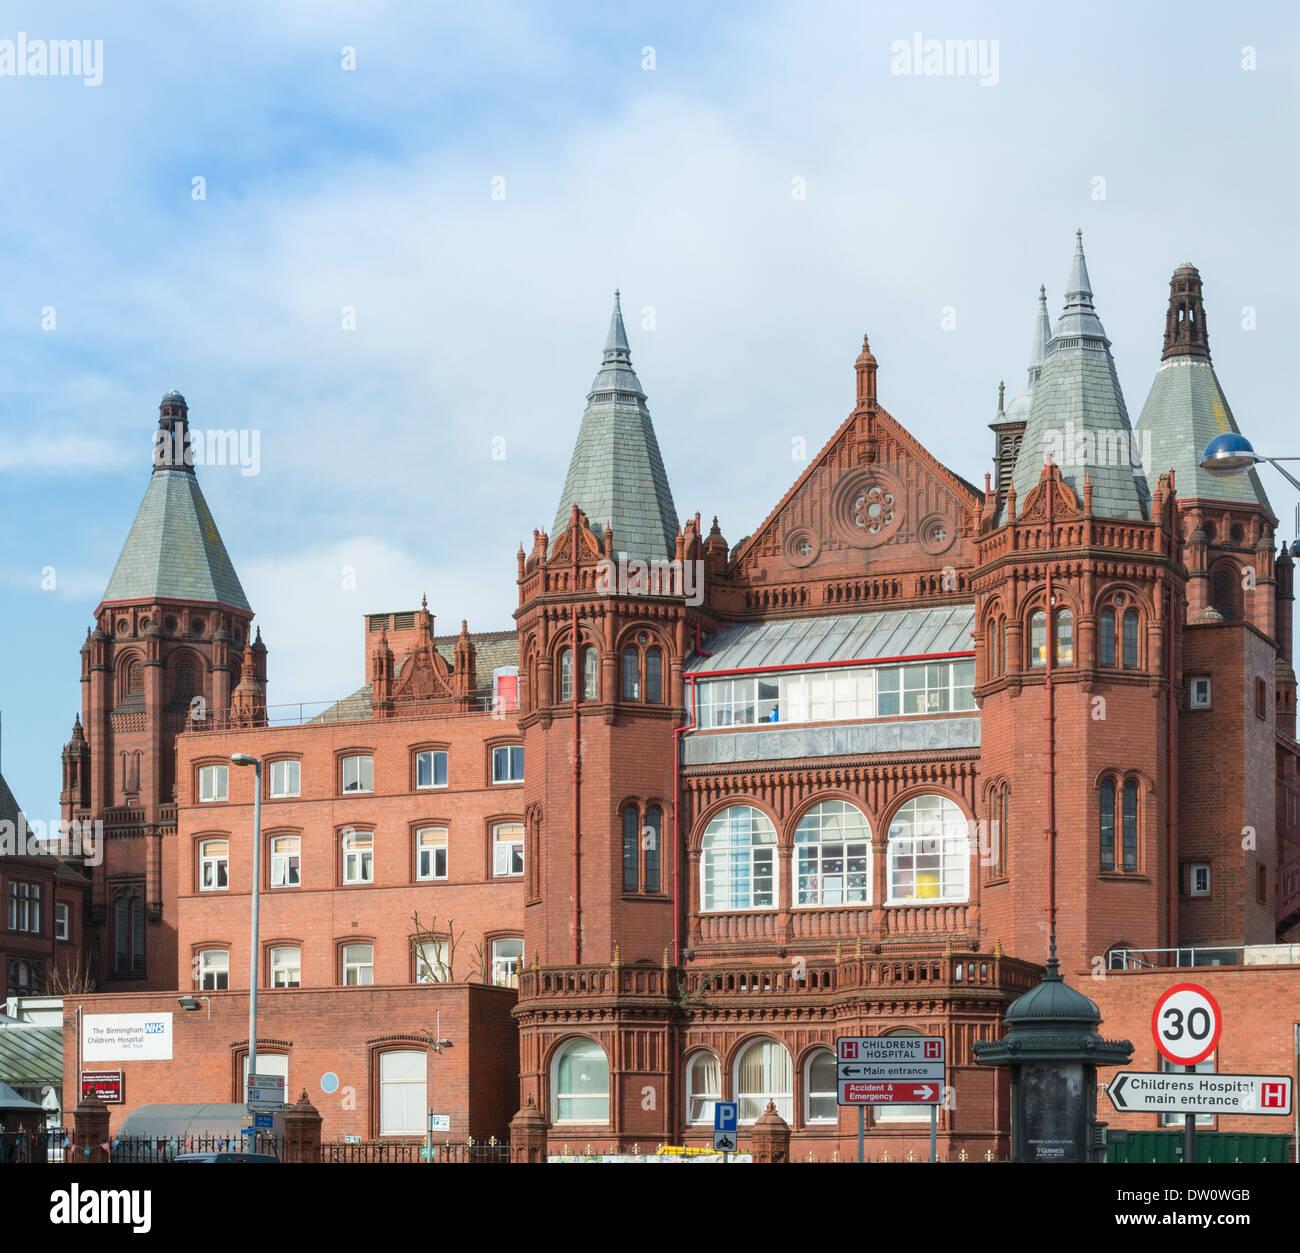 Birmingham Childrens Hospital, City Centre. - Stock Image